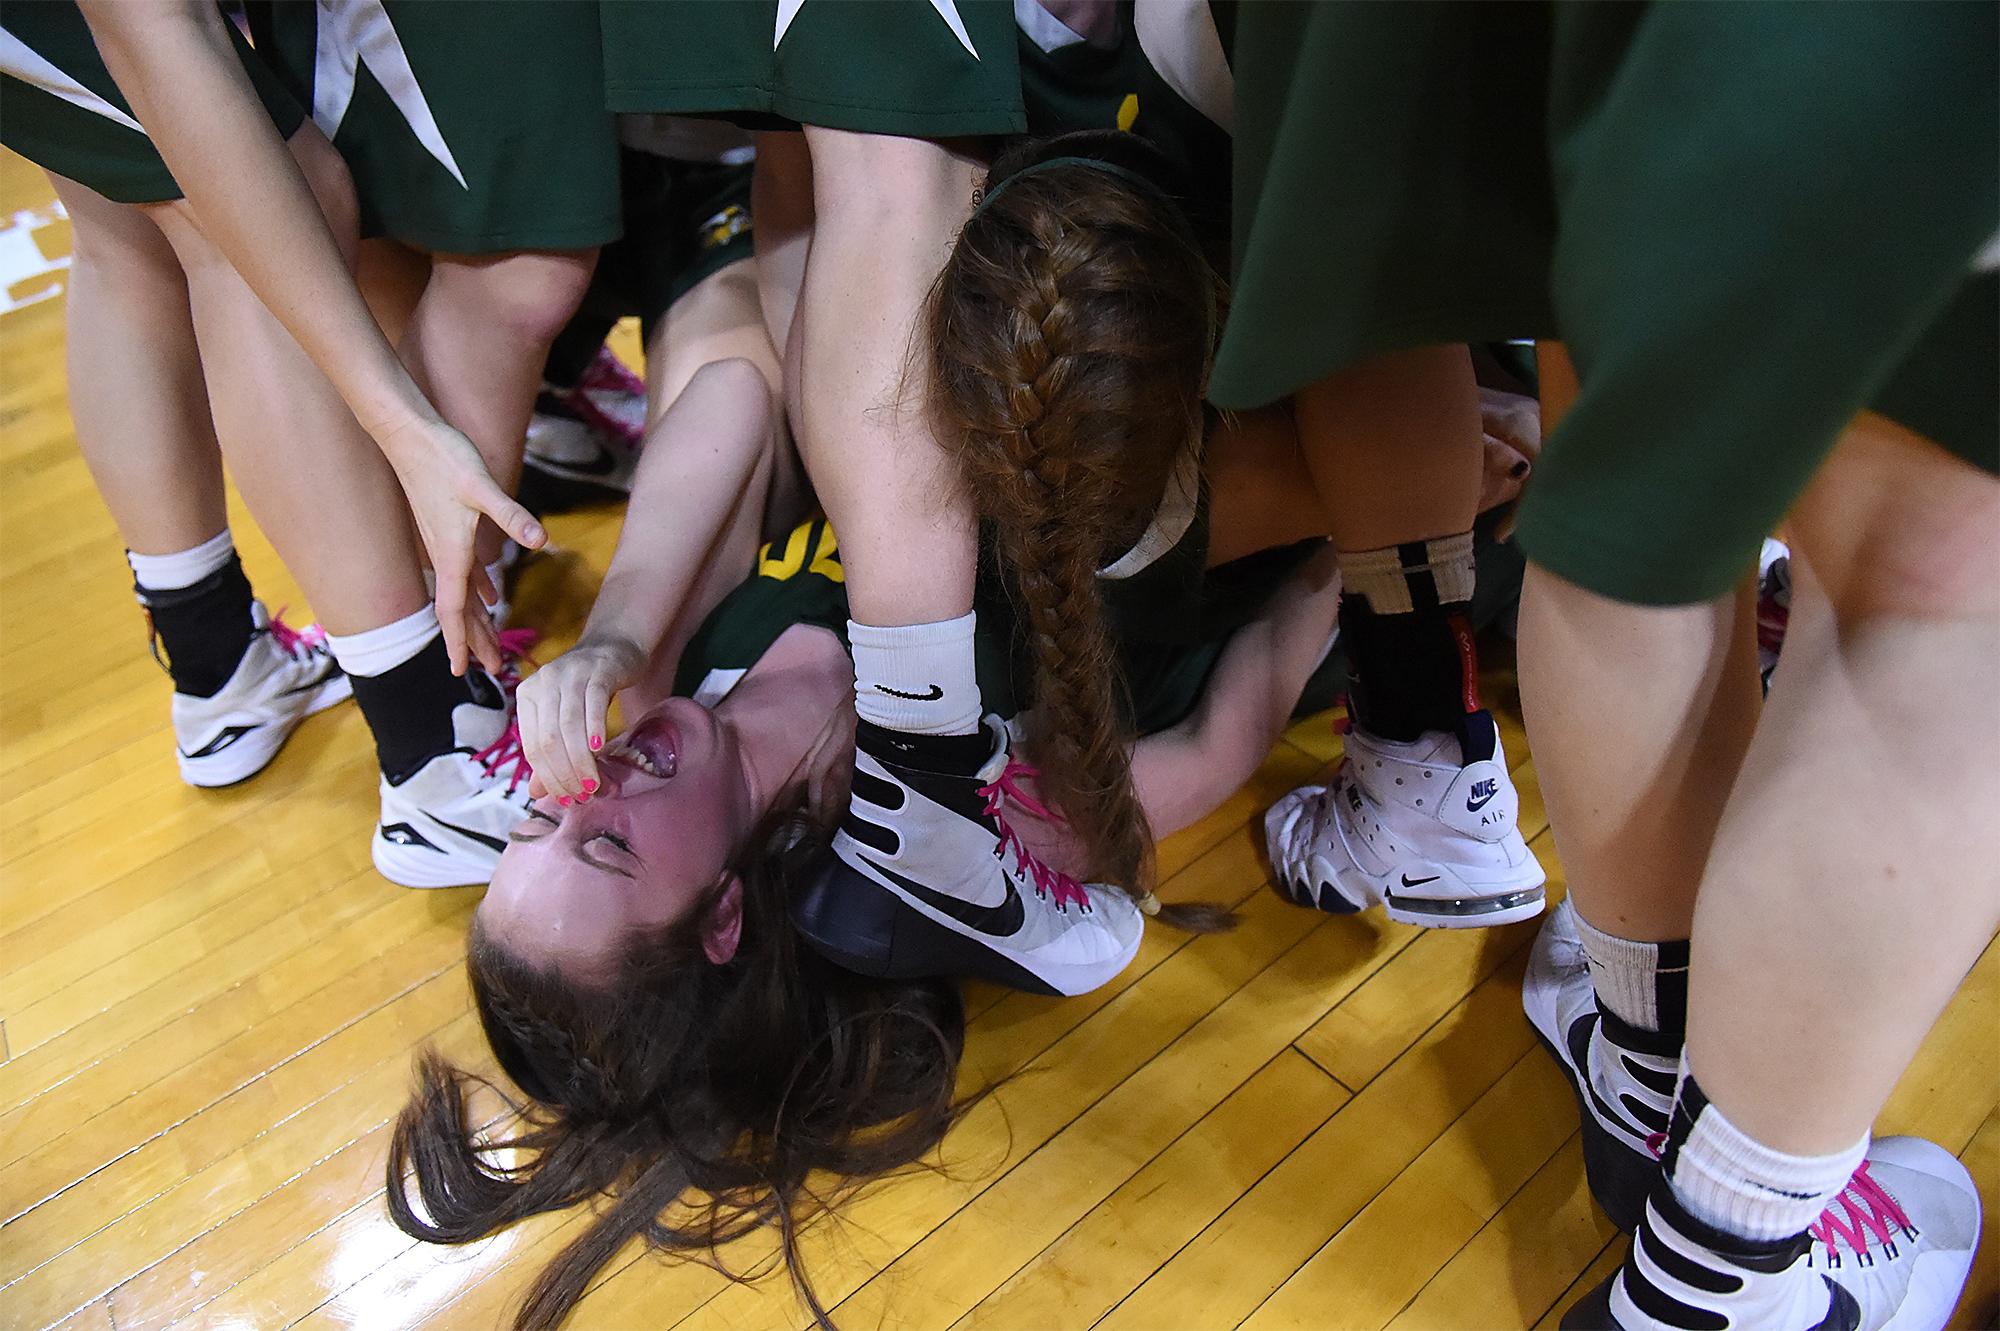 Arhcbishop Wood's Erin Morgan (22) falls to the bottom of a celebration pile following their Philadelphia Catholic League girls basketball championship game on Monday, Feb. 22, 2016 at the Palestra in Philadelphia. Archbishop Wood won the game 40-36 over Neumann-Goretti.